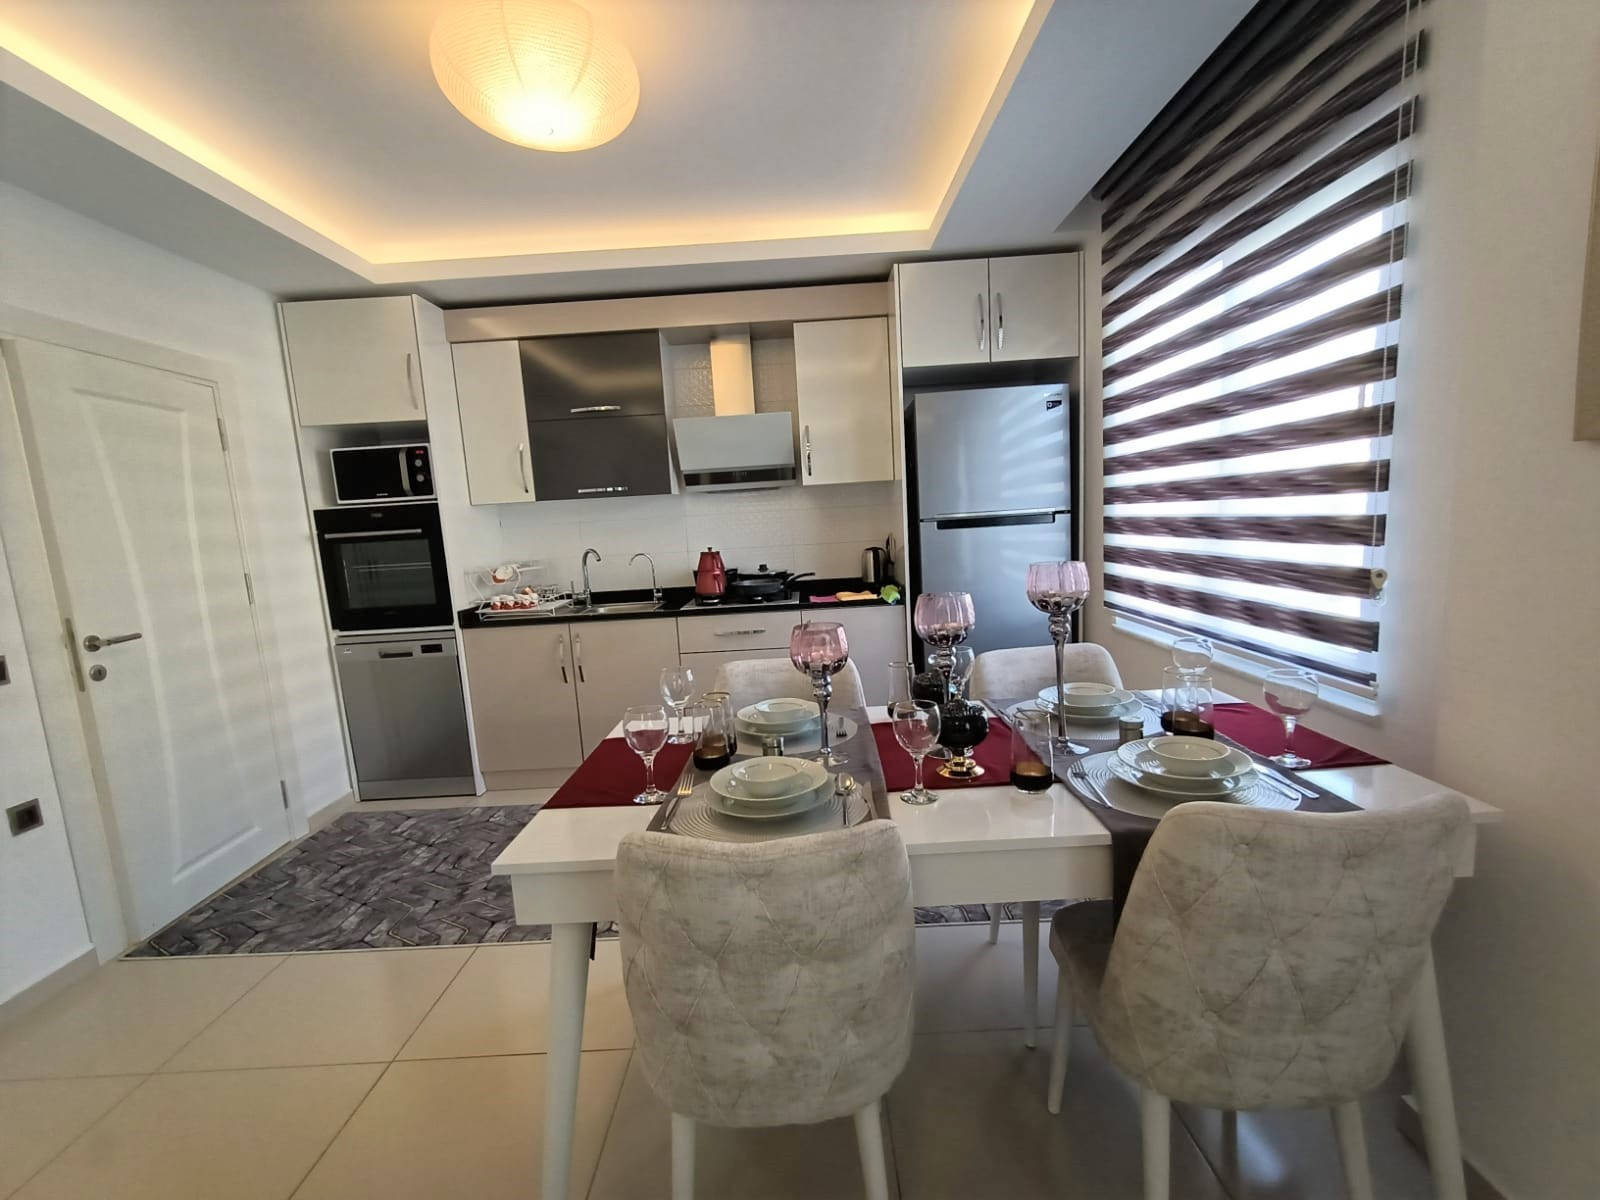 Двухкомнатная квартира с мебелью в районе Махмутлар - Фото 6